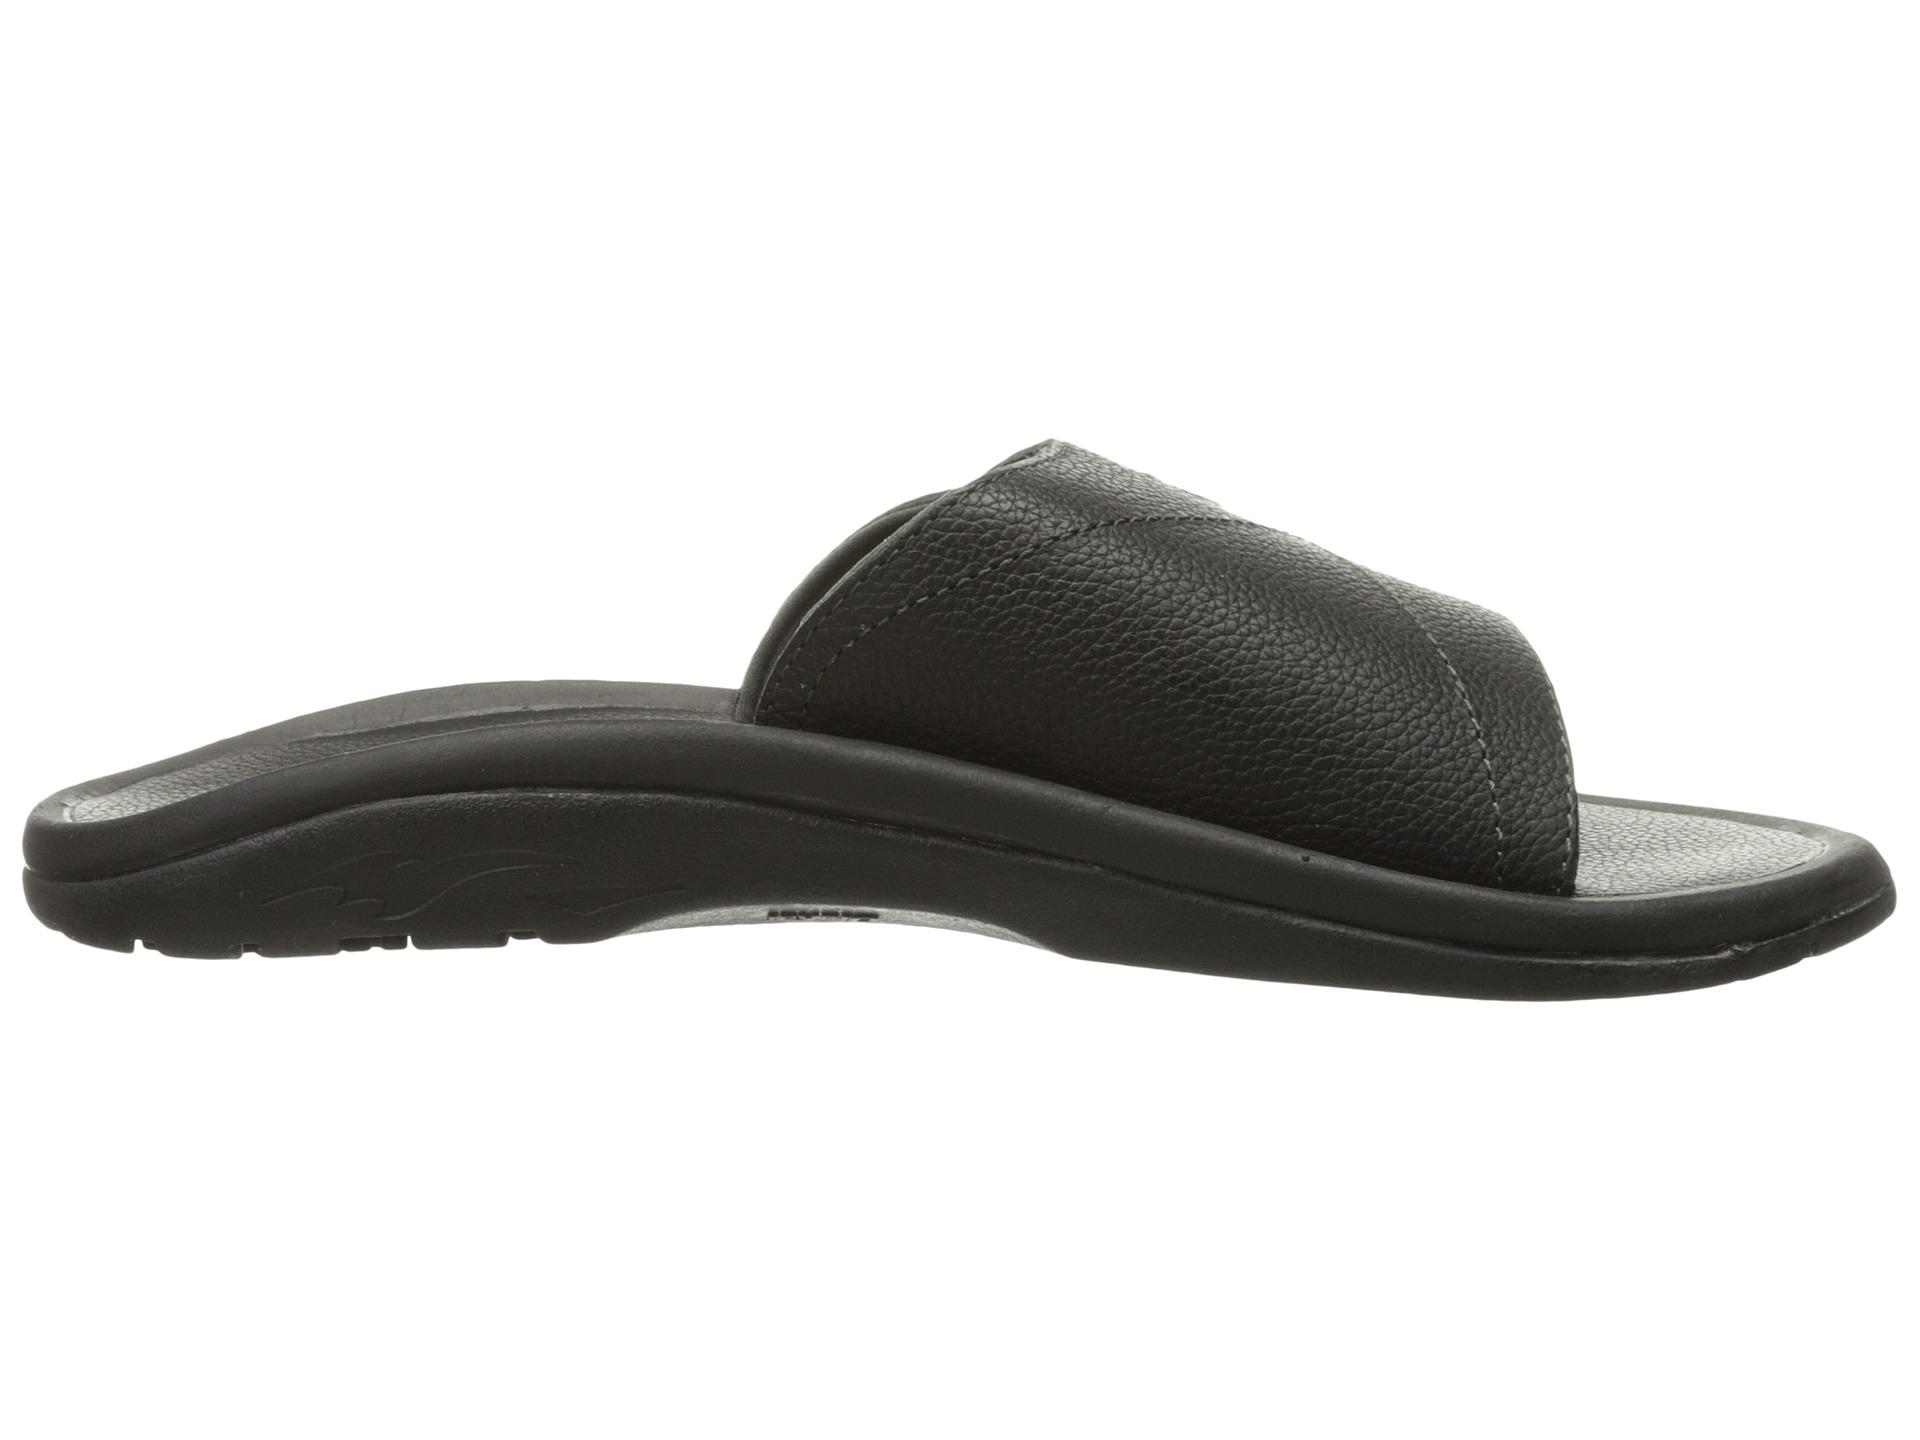 Olukai Ohana Leather Slide Black Black Zappos Com Free